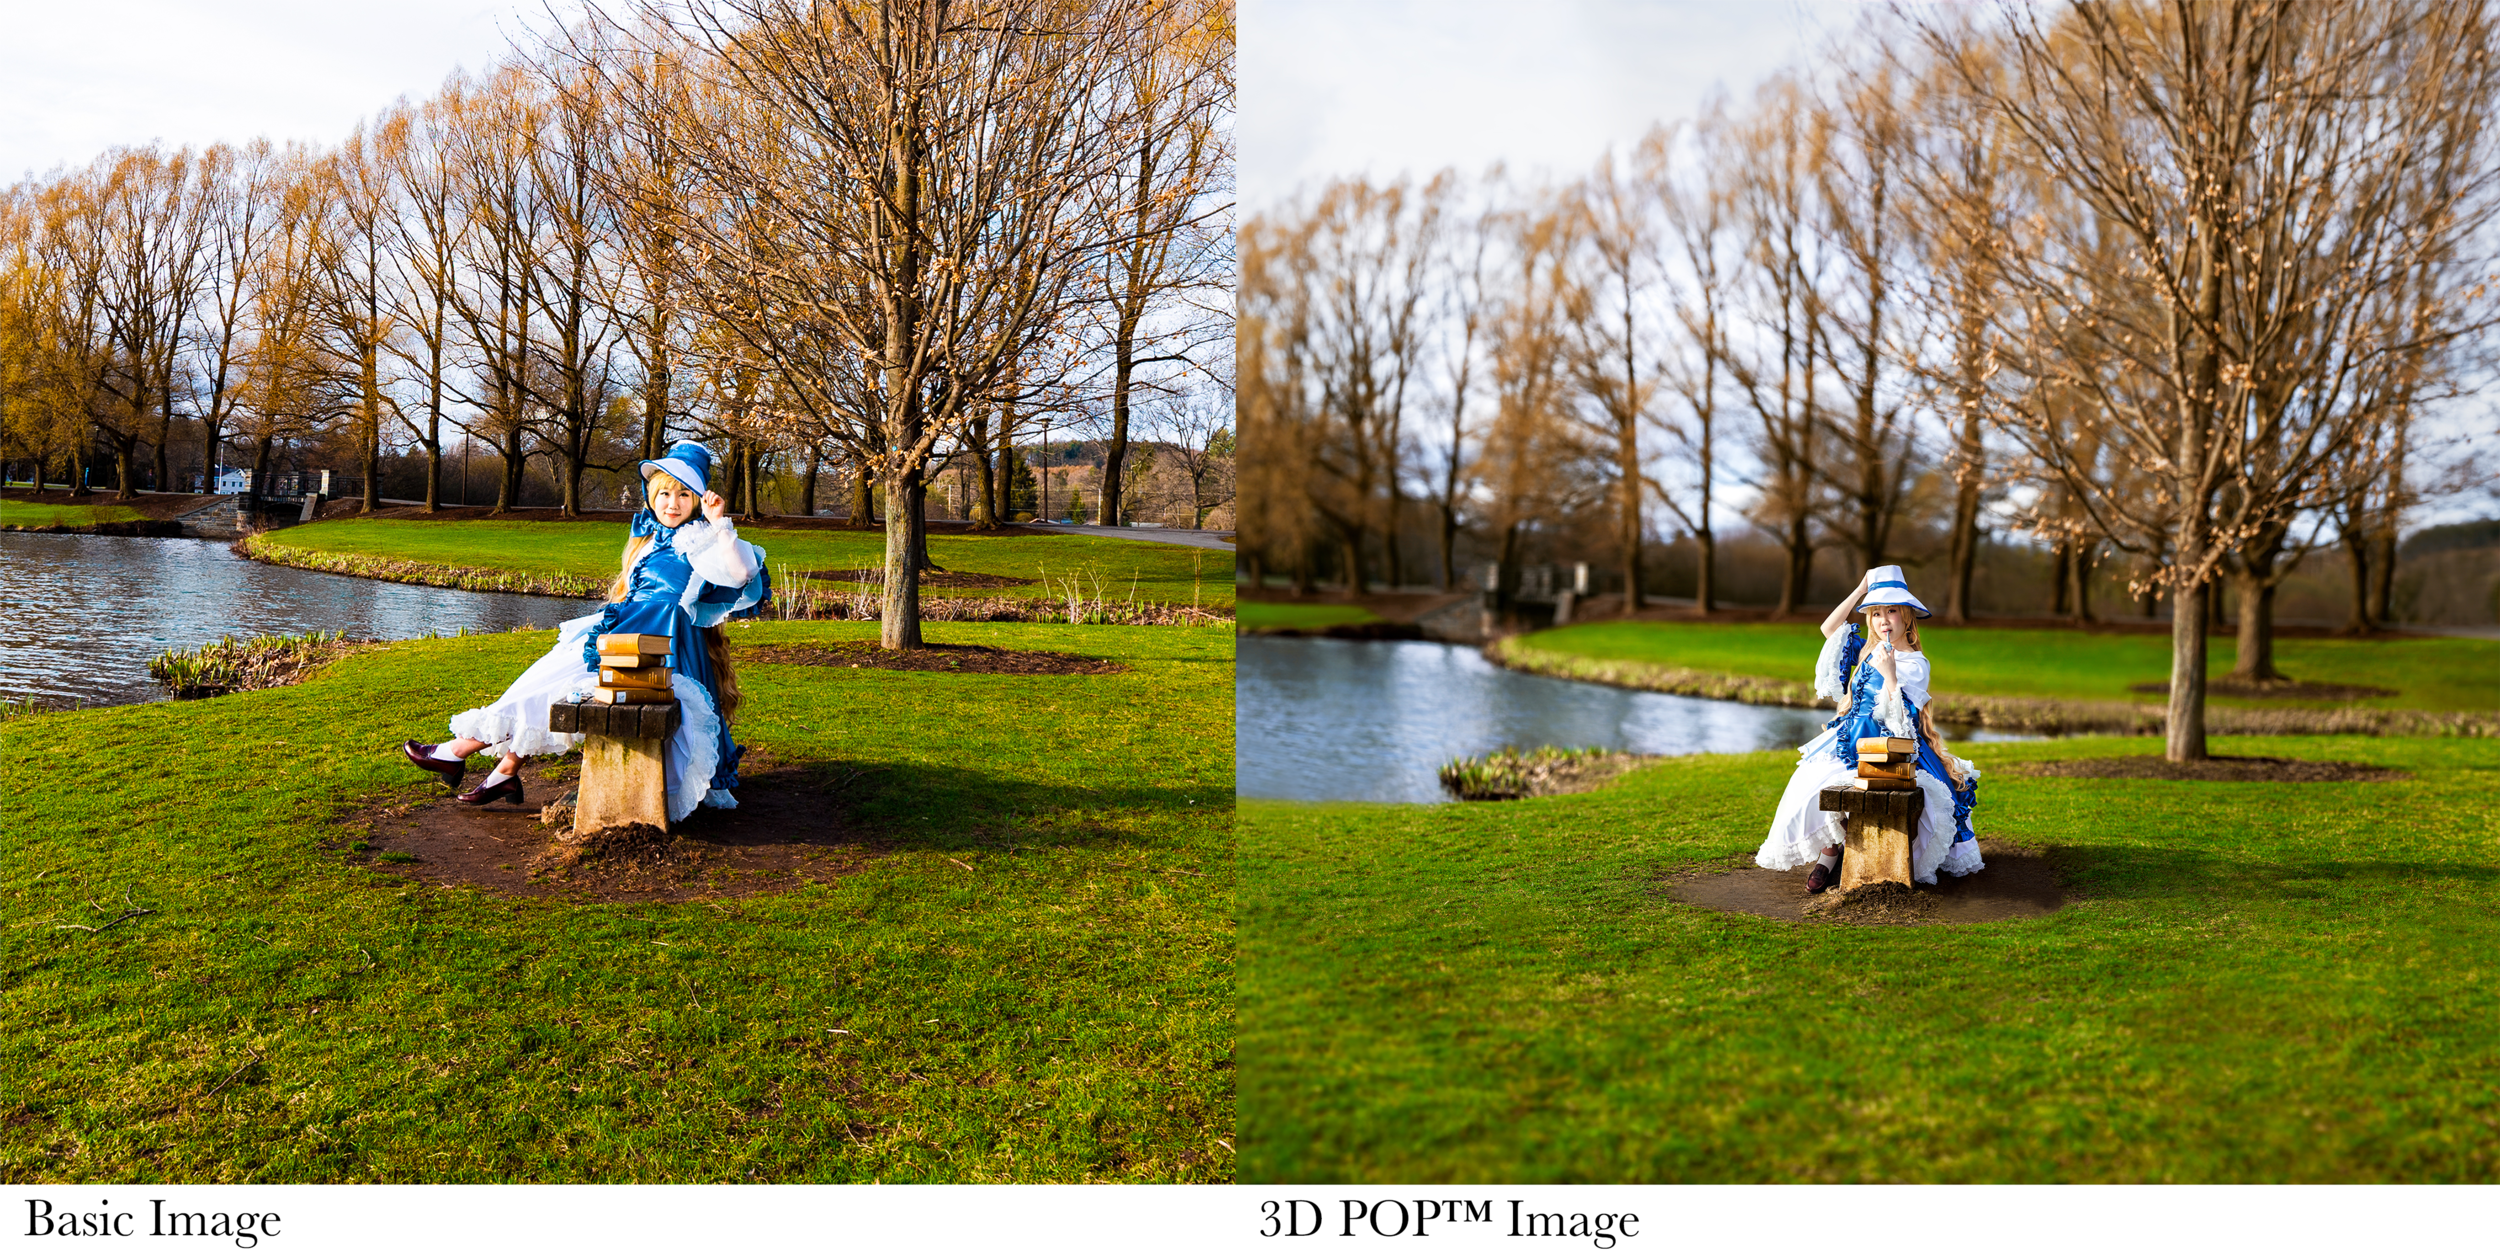 Basic Image vs. 3D POP Image (6) LOW RES 20MB.png